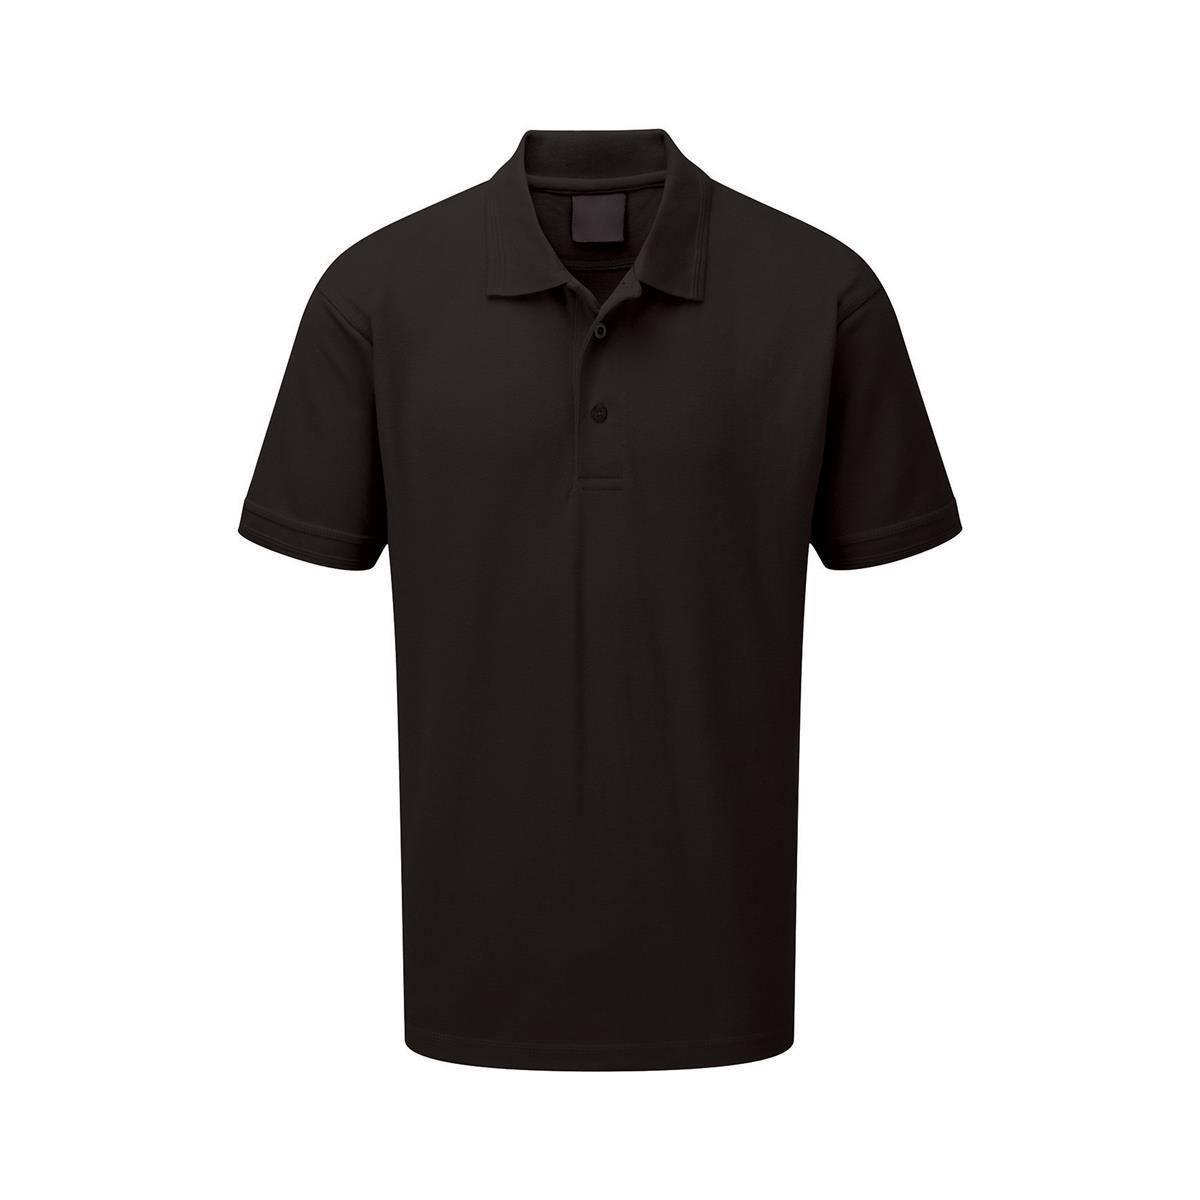 Polo Shirt Classic Polycotton Small Black 1-3 Days Lead Time